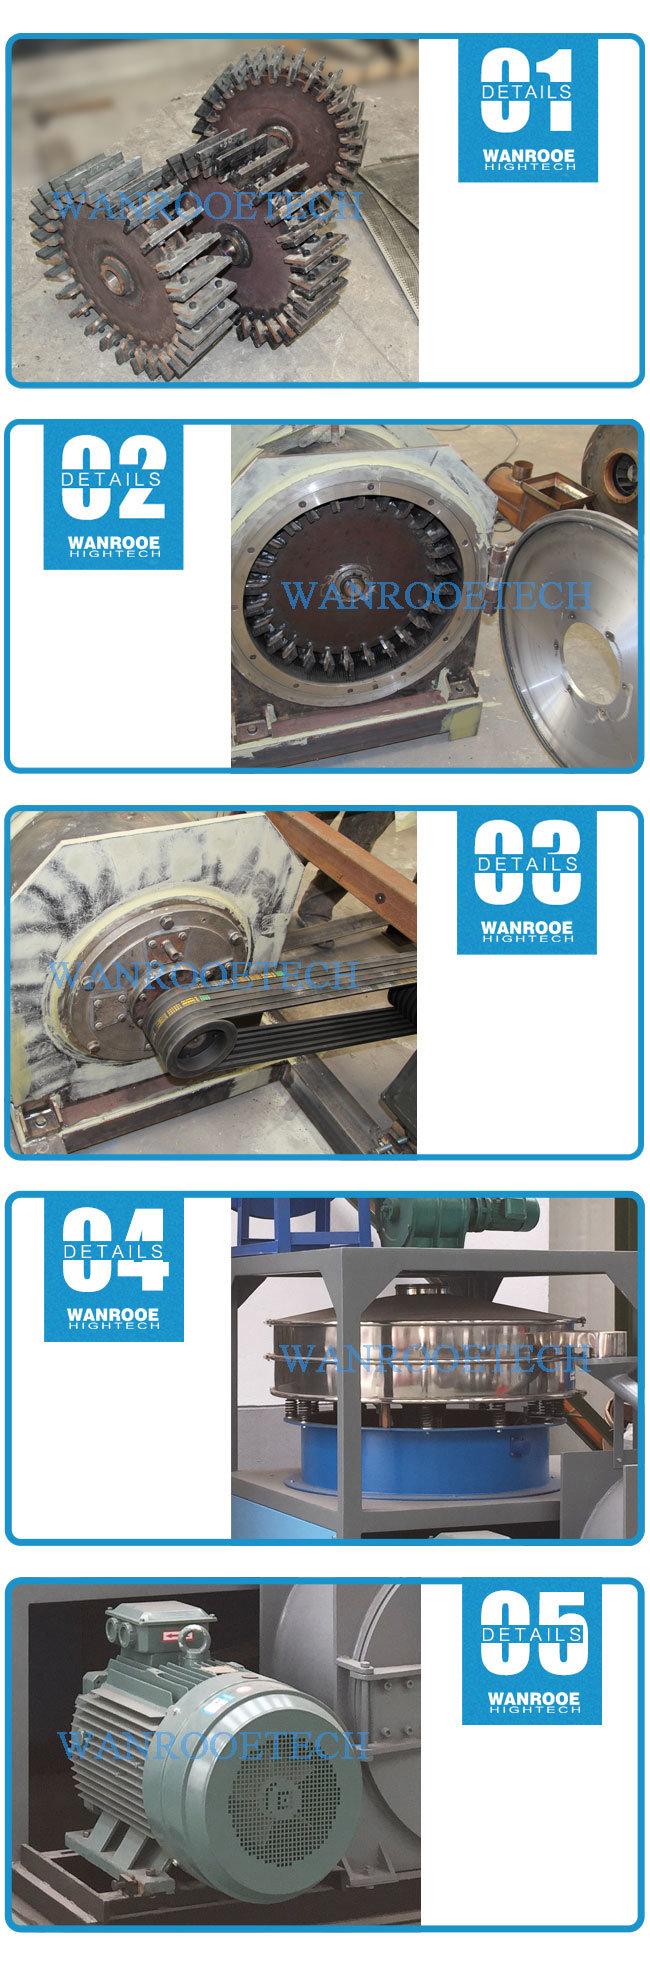 Pnmp Grinding Disc Rigid PVC UPVC Plastic Powder Pulverizer Machine